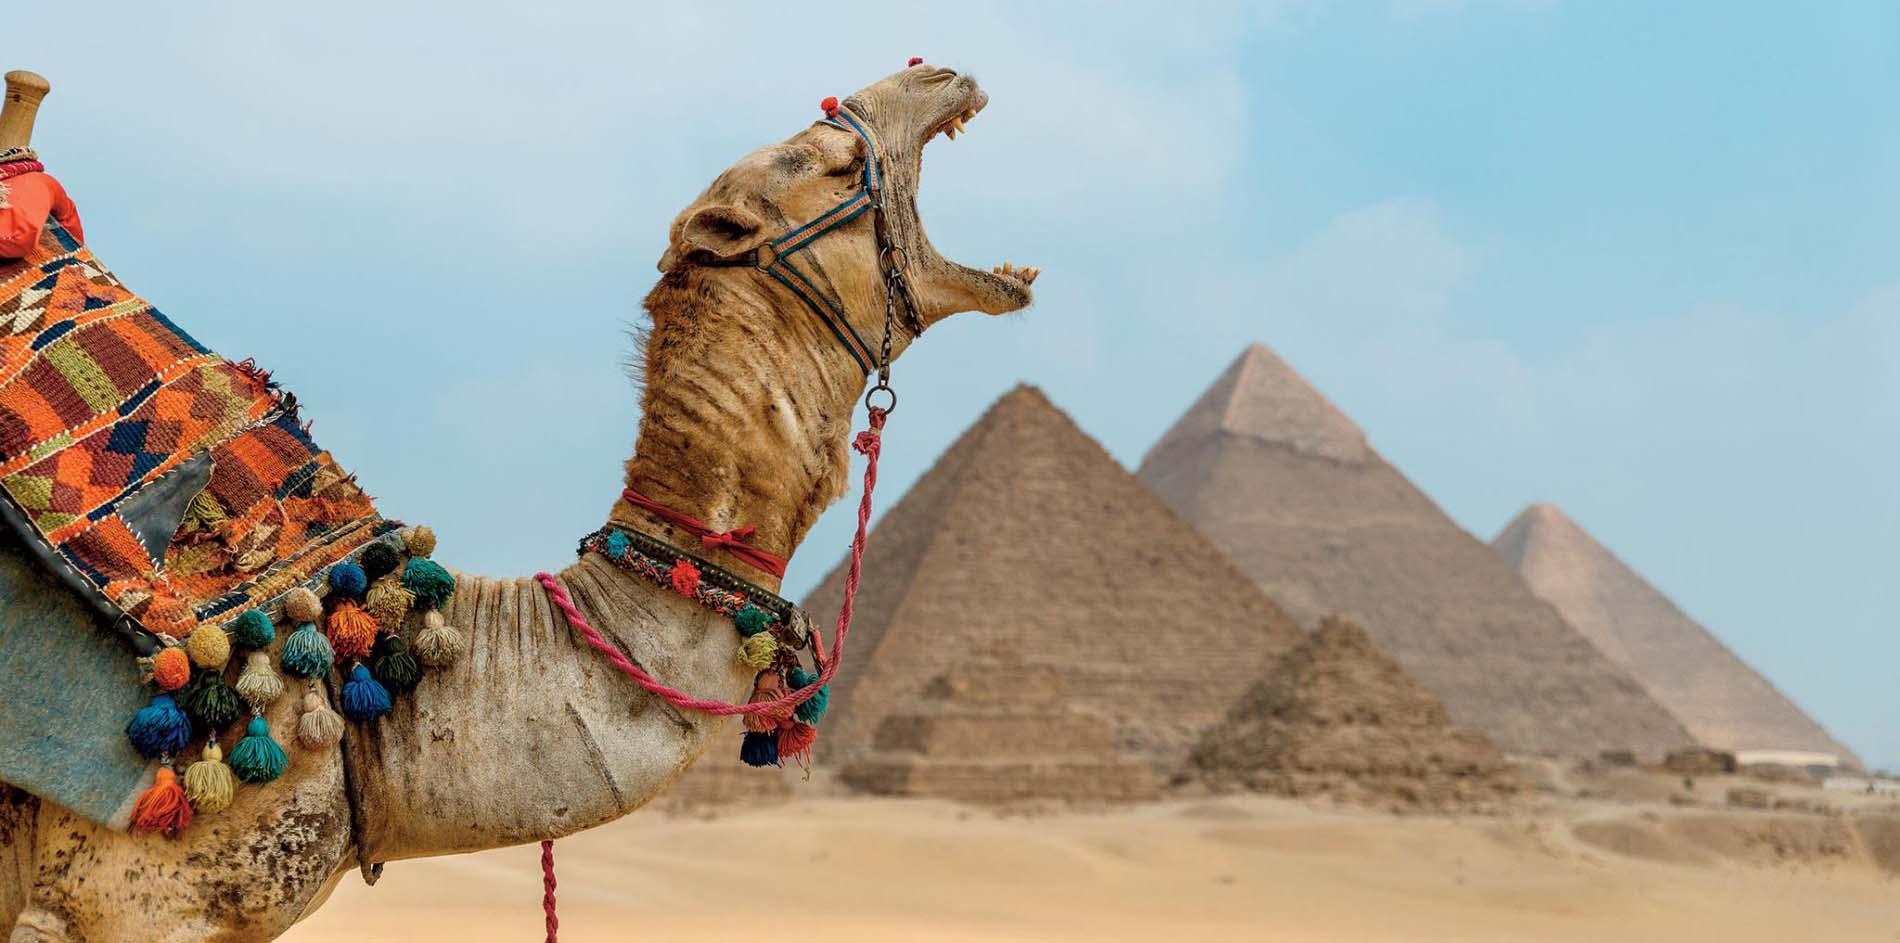 9 Tage Kairo, Nilkreuzfahrt und Badeurlaub